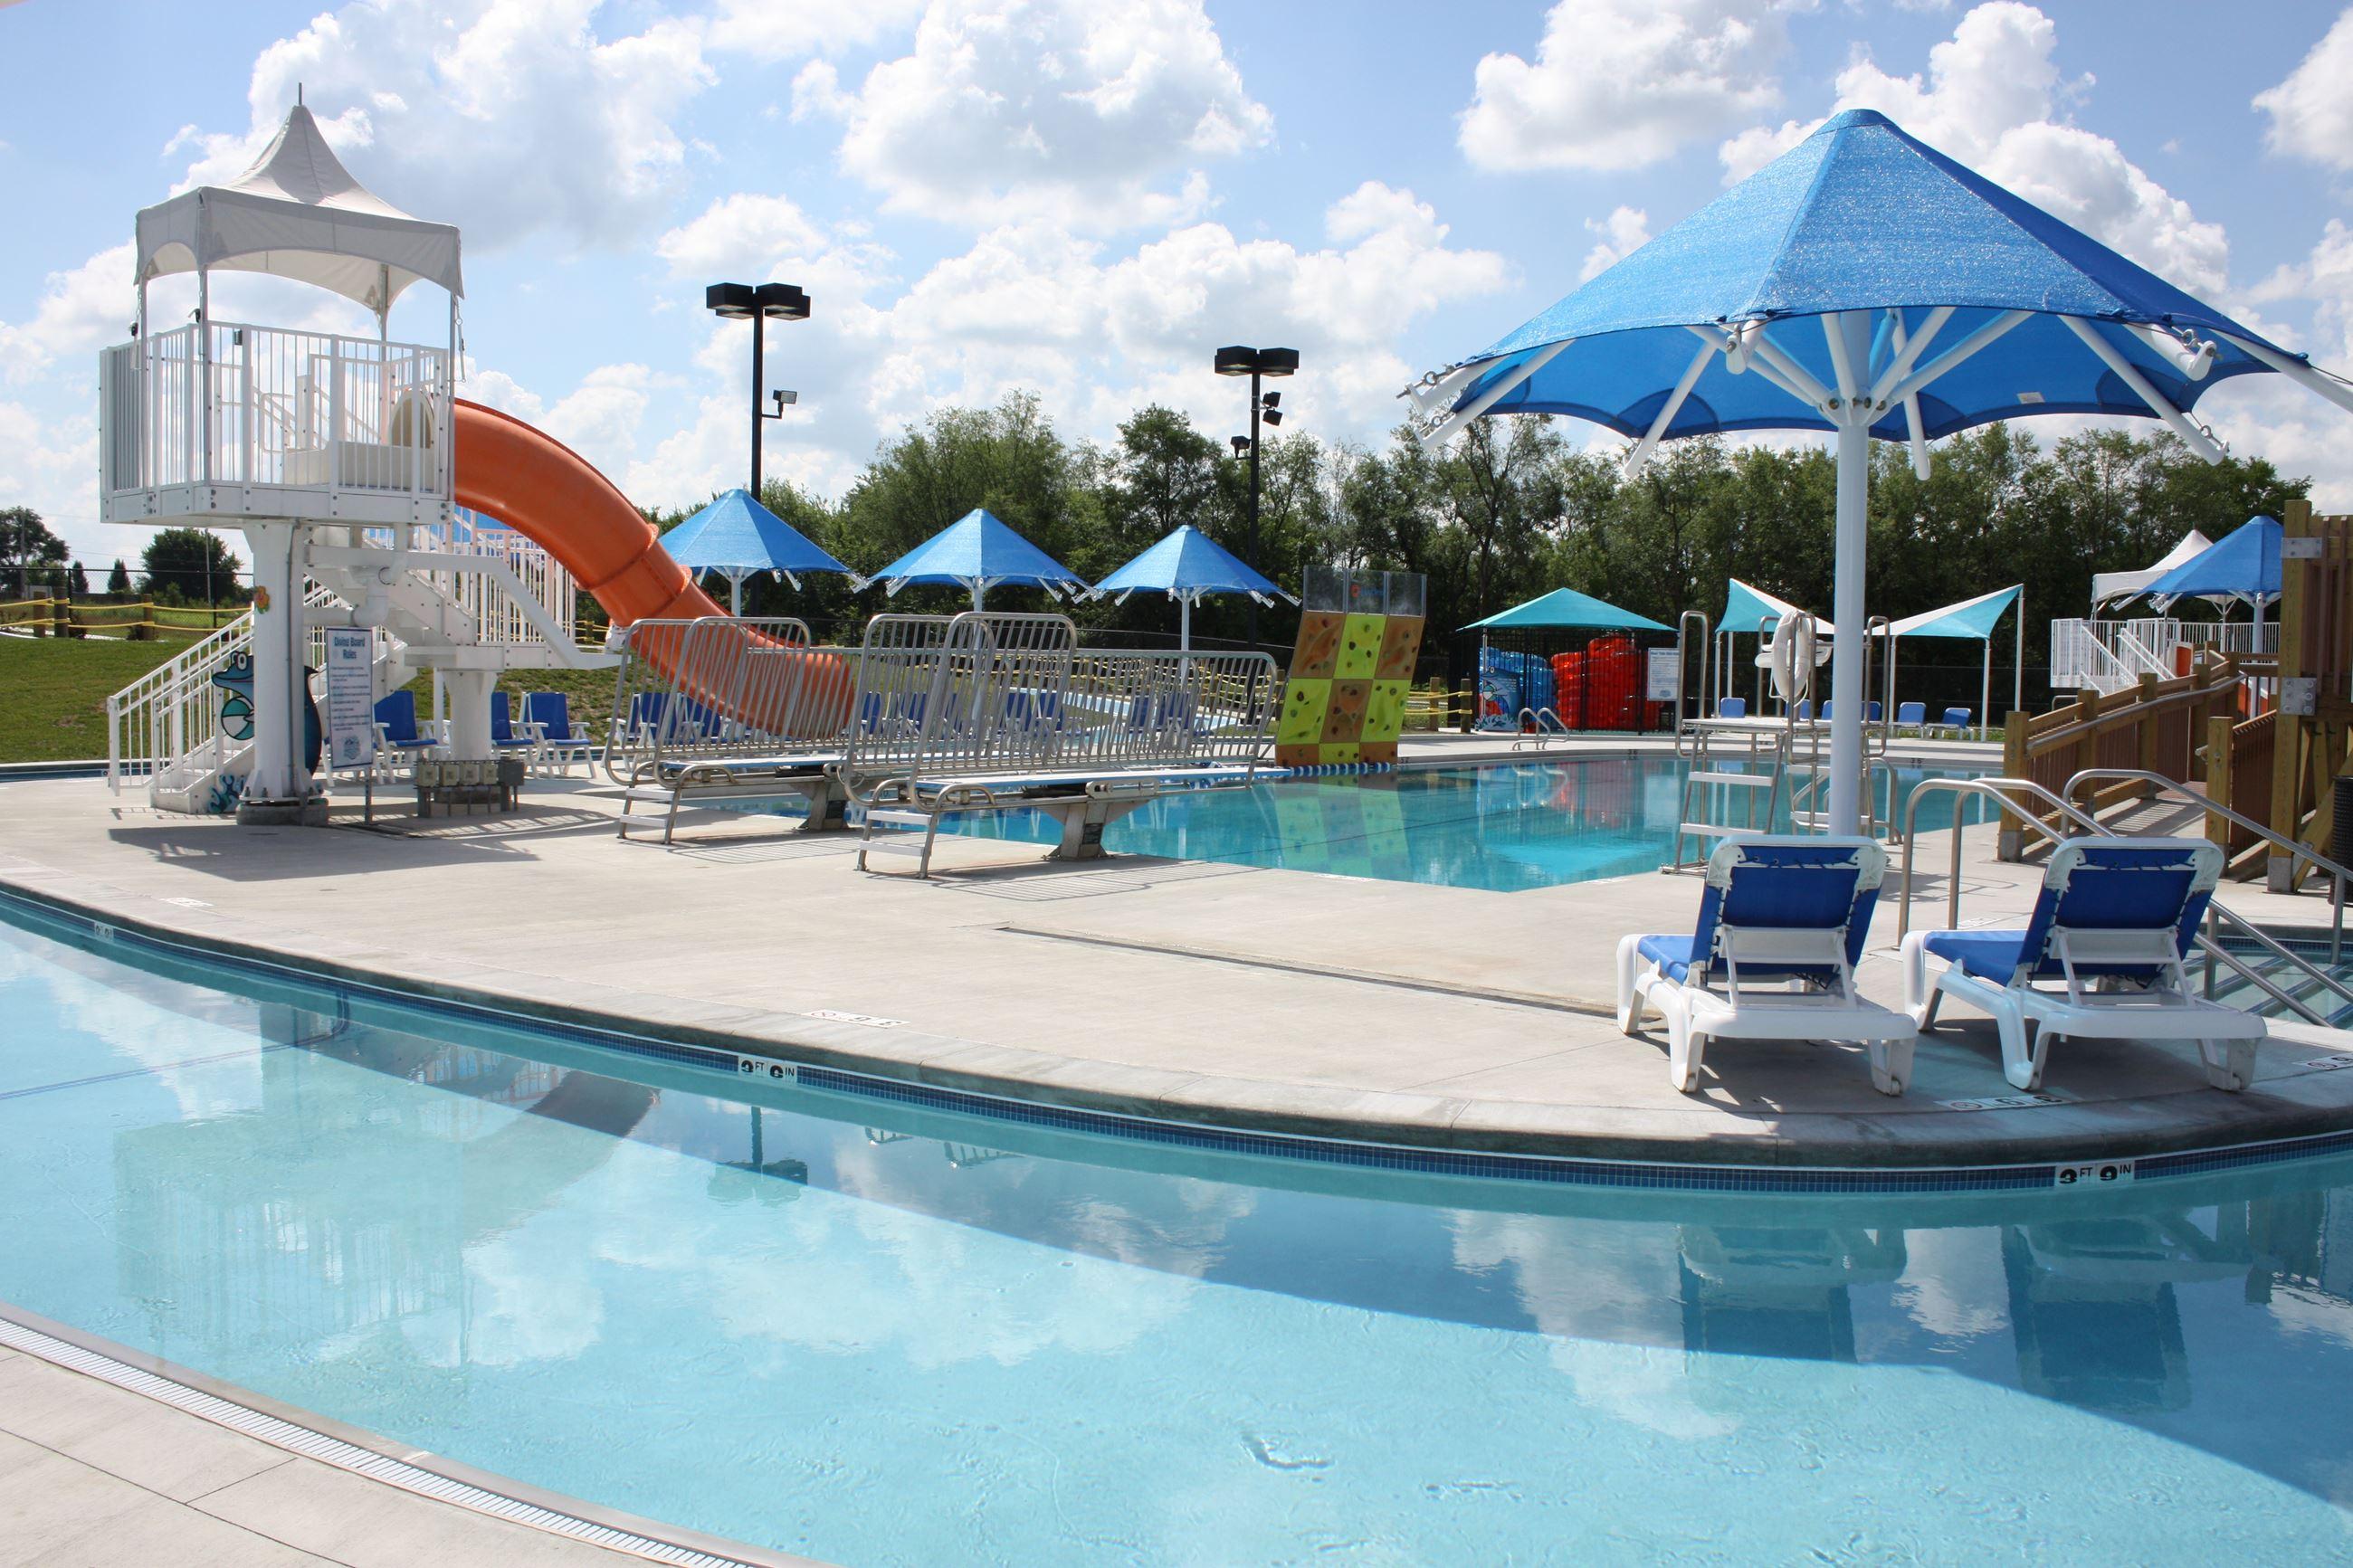 Family Aquatic Center - Vernon Hills Park District